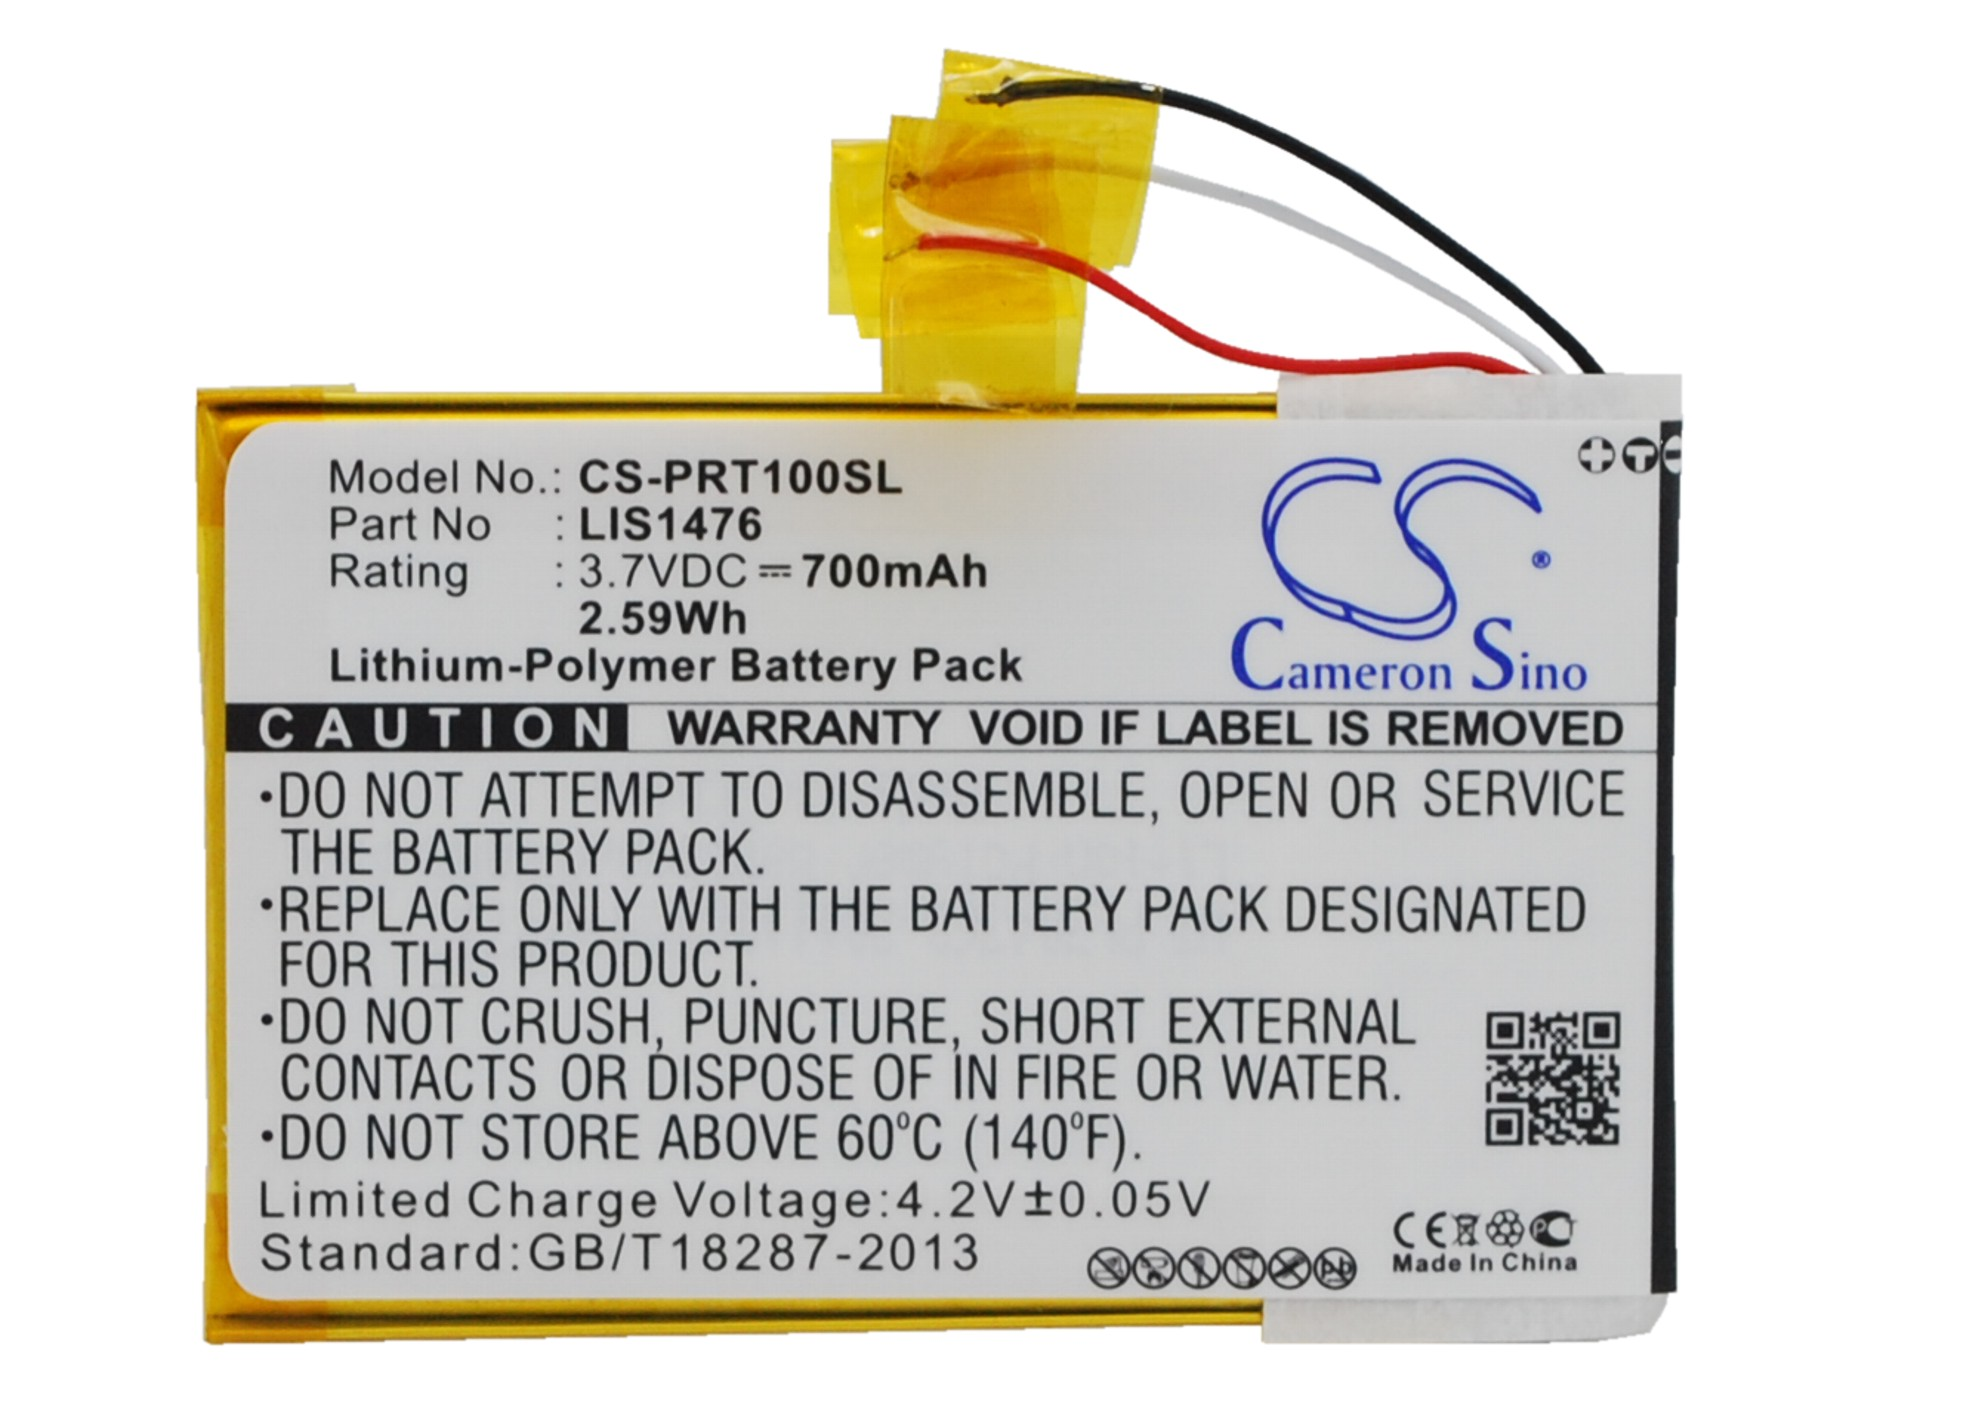 Cameron sino 700 mah bateria 1-853-104-11, lis1476, lis1476mhppc (sy6) para sony PRS-T1, PRS-T2, PRS-T3, PRS-T3E, PRS-T3S